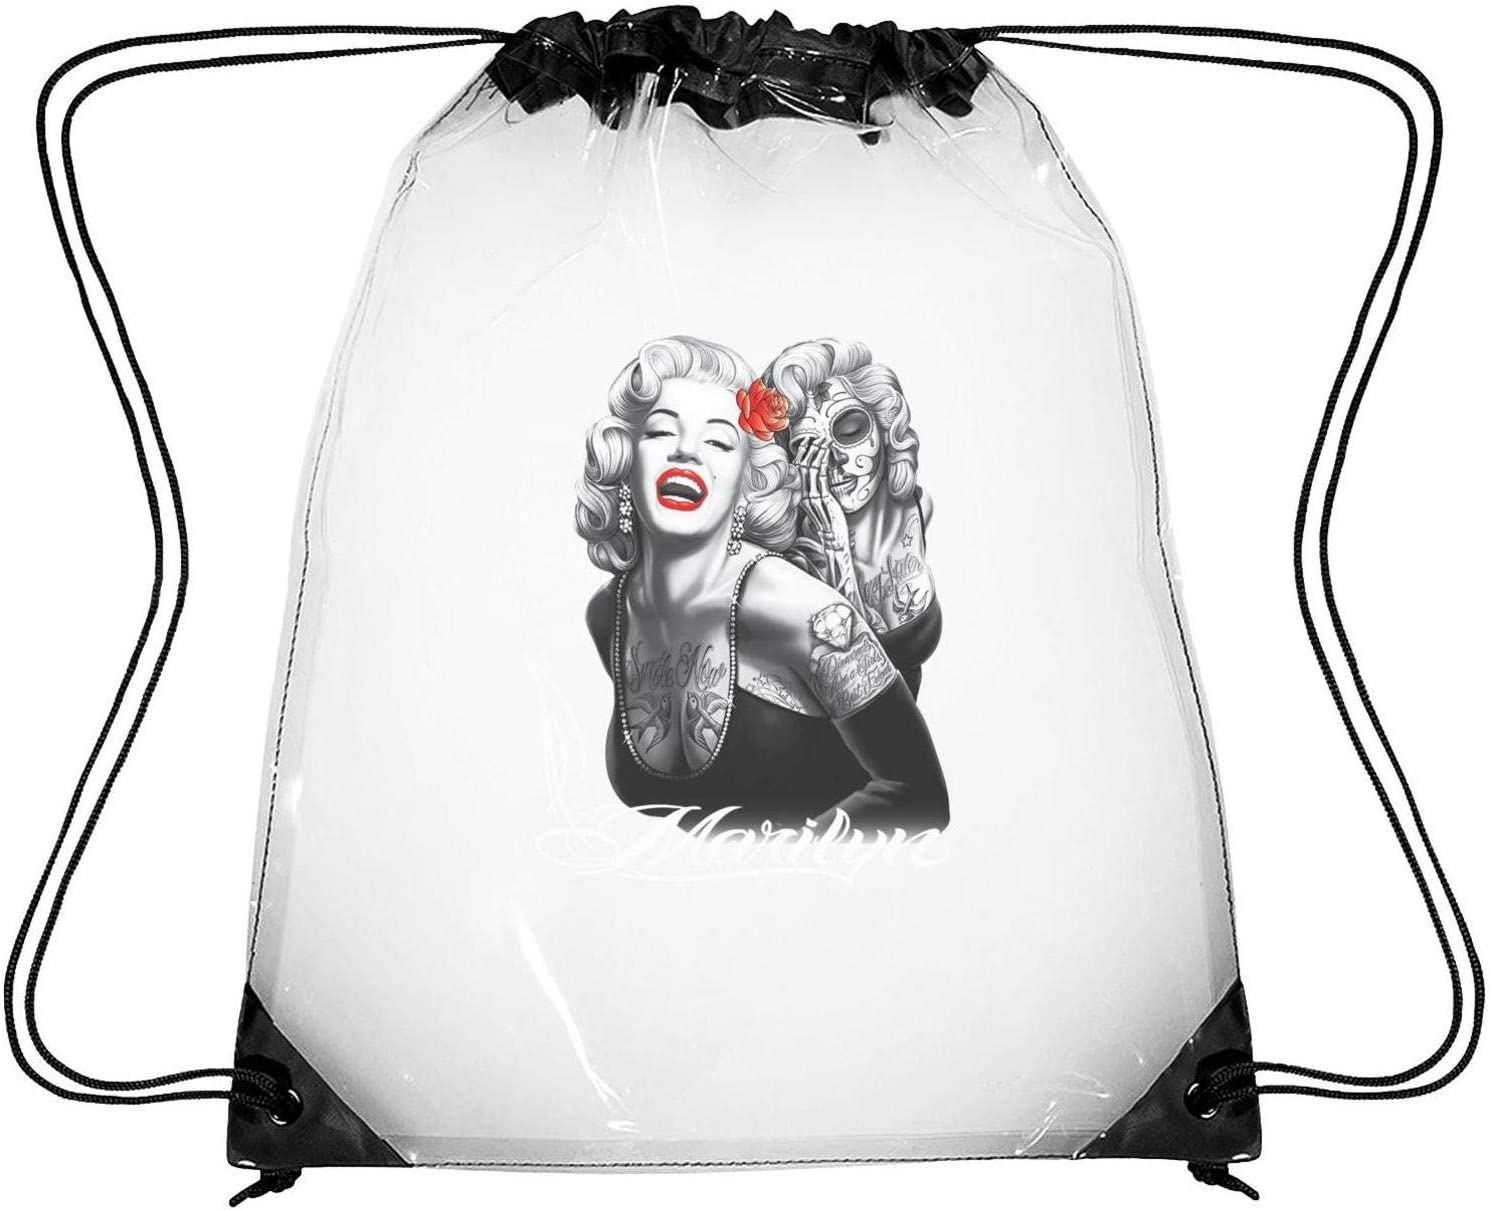 YAYAZAN Clear Drawstring Backpack Film Character Dancing Bag Gym Sports Travel Sack Pack for Men Women